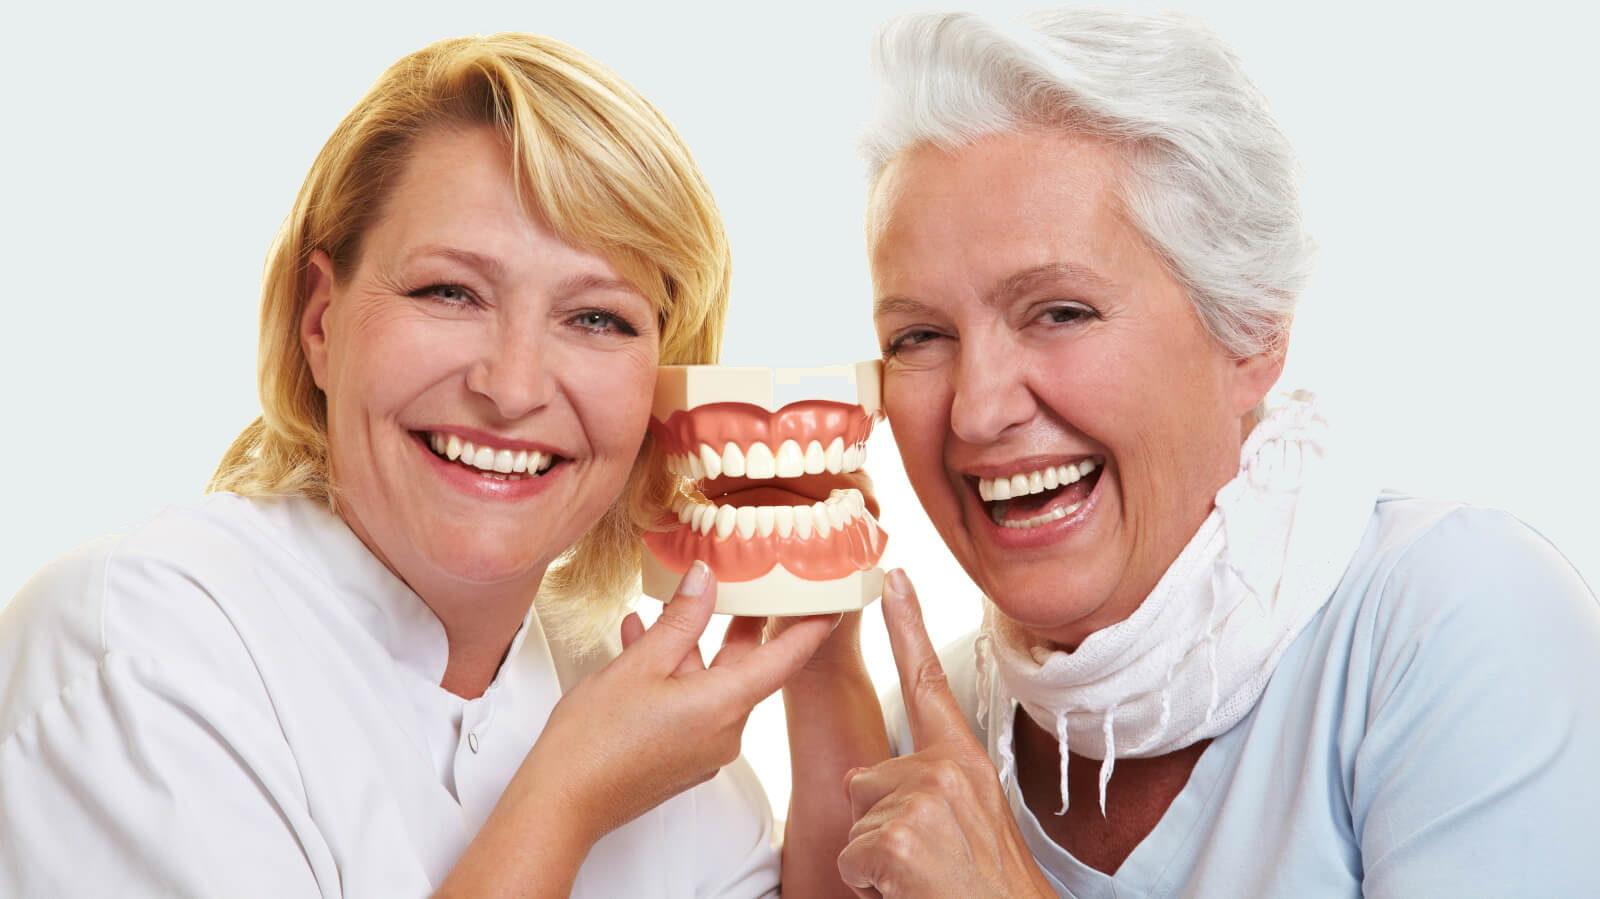 Protezirovanie zubov pensioneru e1516481619753